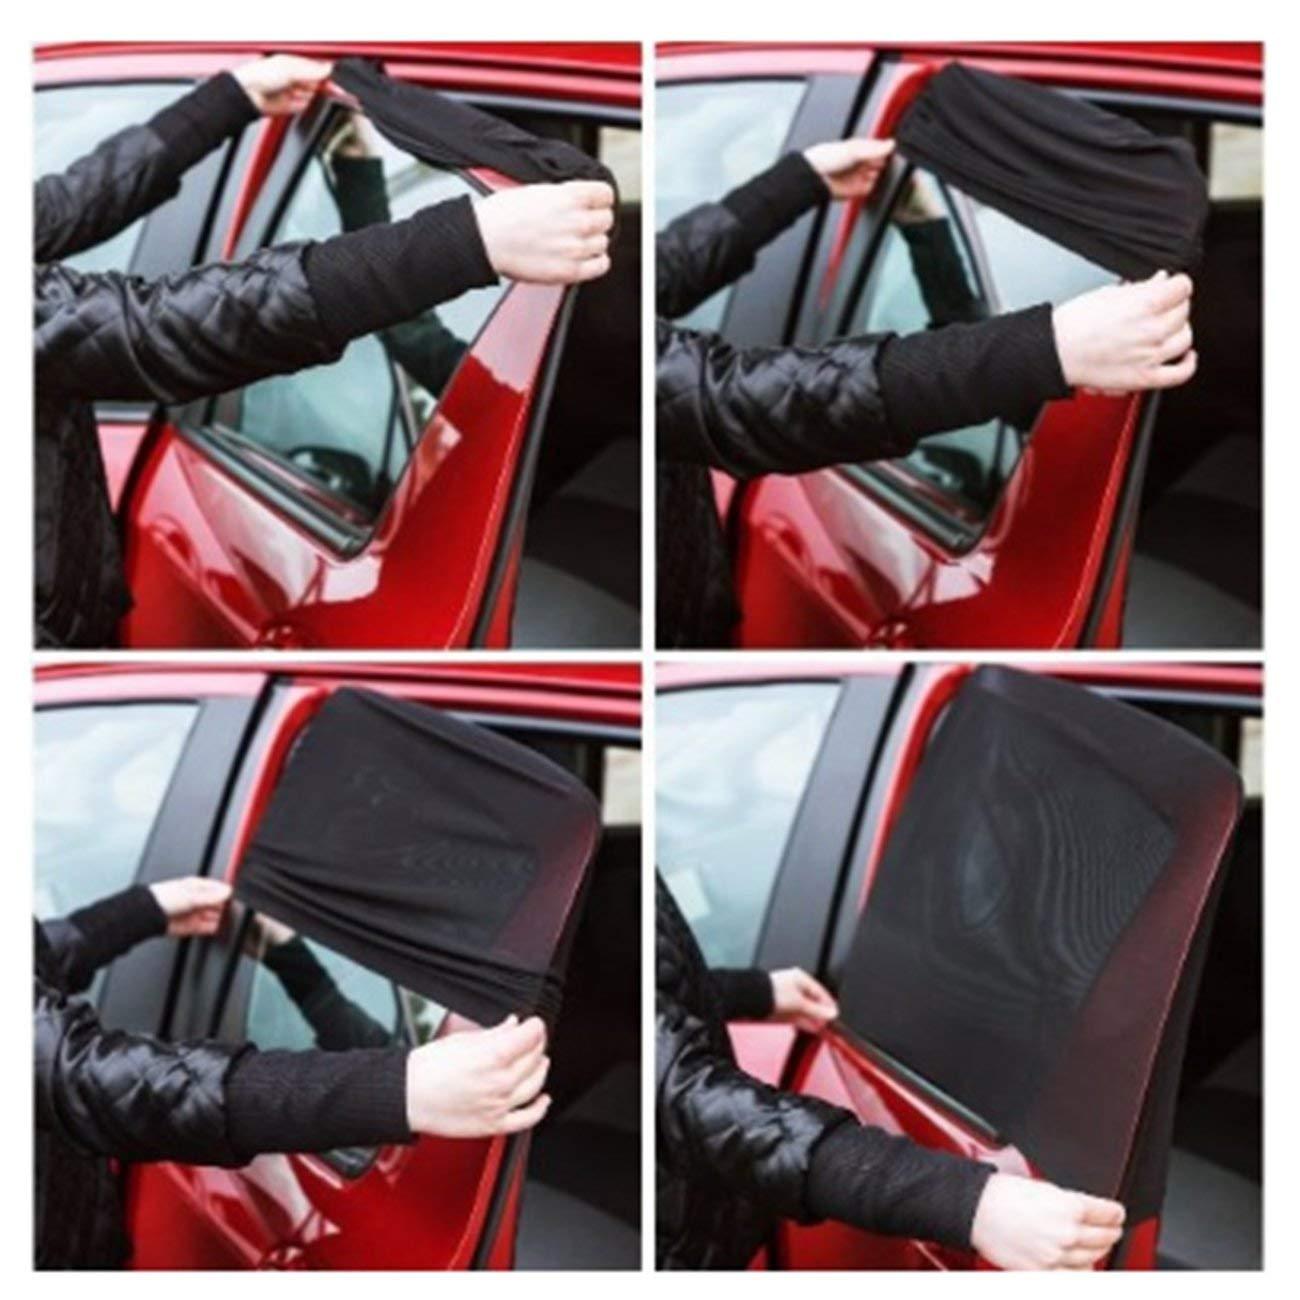 Fannty 1 pair Car Curtain window sunshade summer sunscreen mosquito blind shade hood